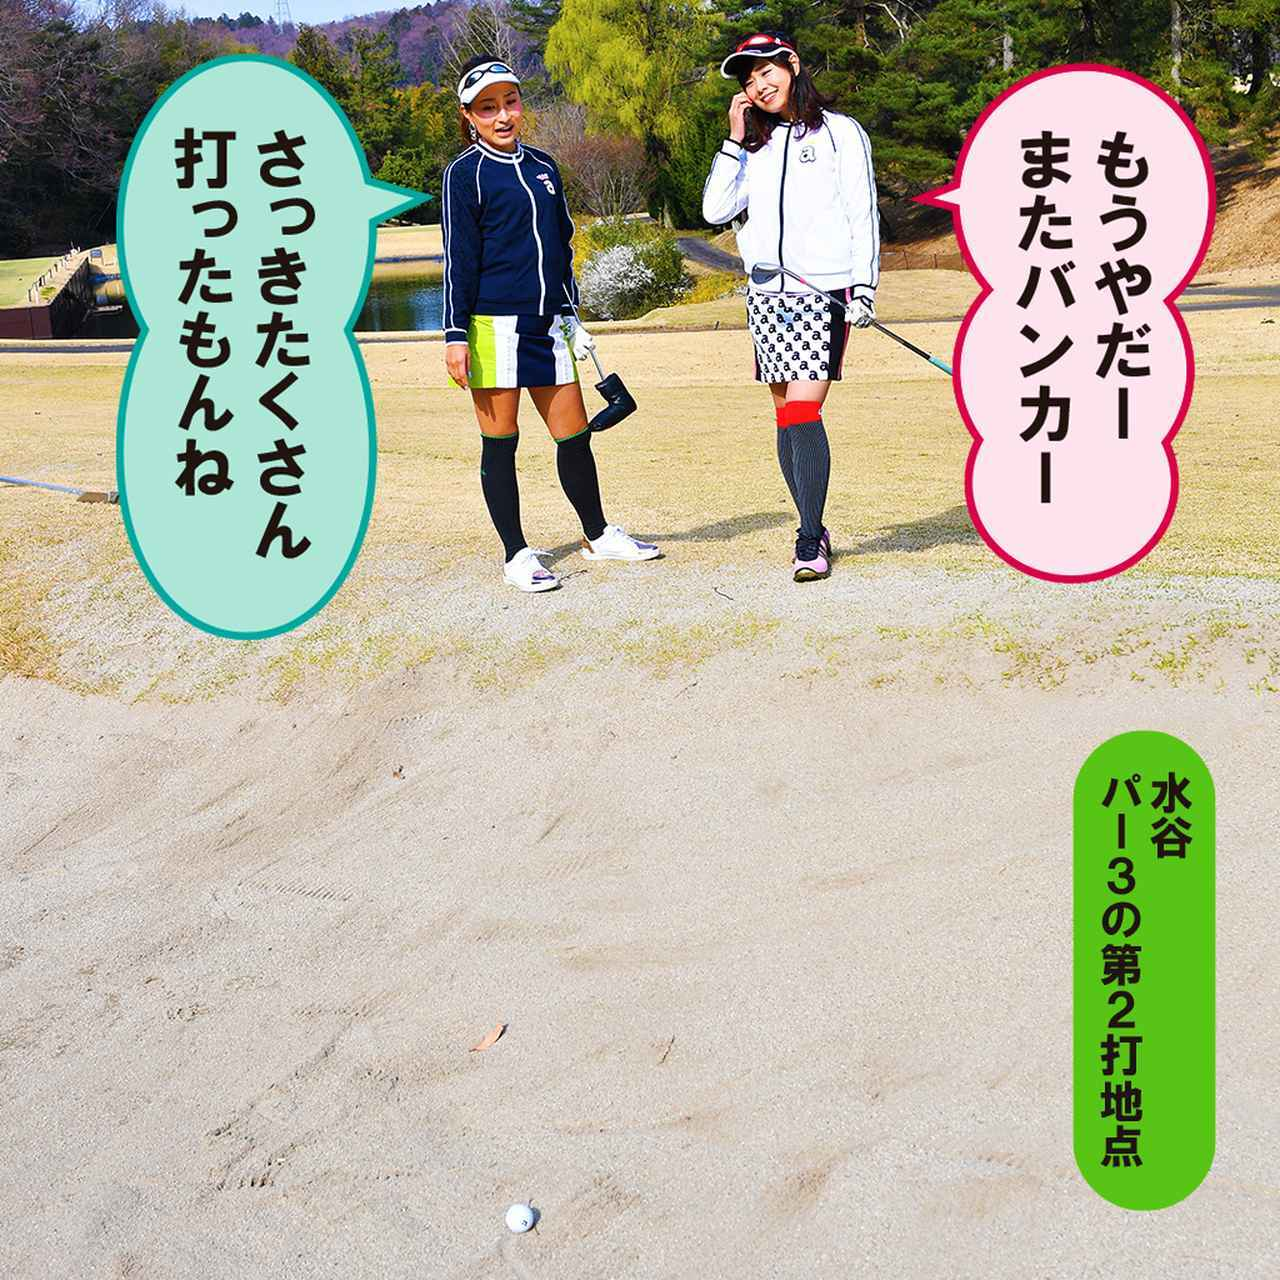 画像: ゴルル会員番号14 板倉由姫乃、ゴルル会員番号44 水谷花那子